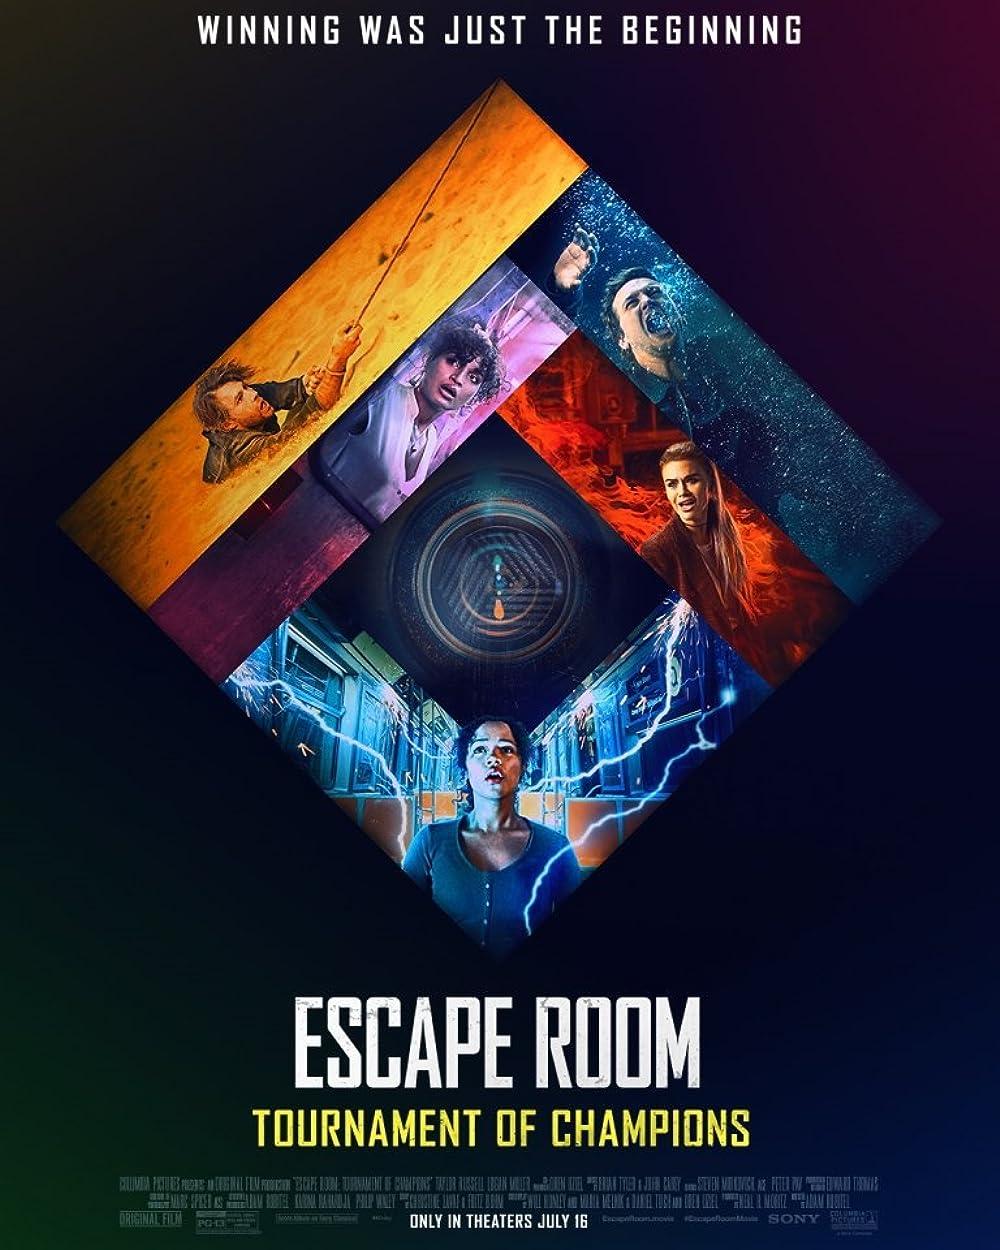 Download Escape Room Tournament of Champions 2021 English 480p HDRip ESub 300MB